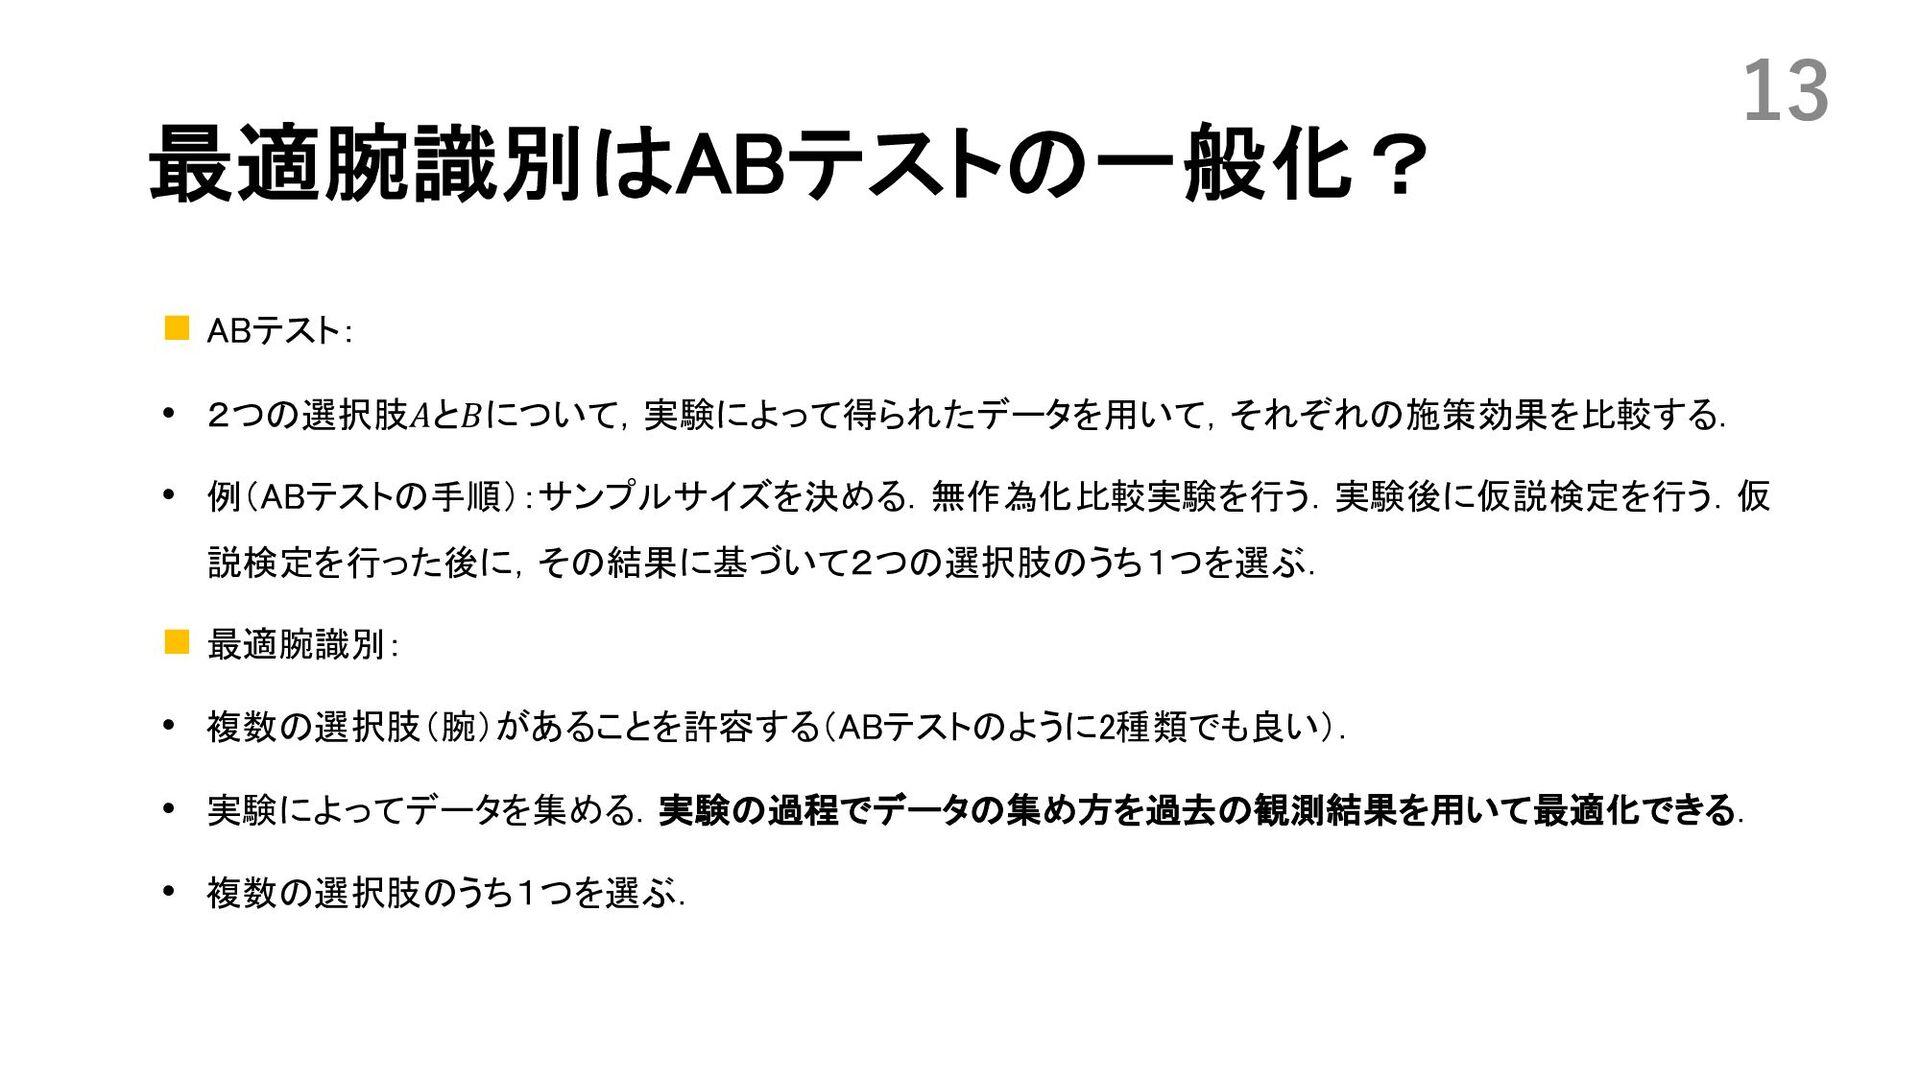 n 𝐾 = 2本の腕からの報酬が • それぞれ分散既知の正規分布𝒩 𝜇* , 𝜎+ に従うとし...